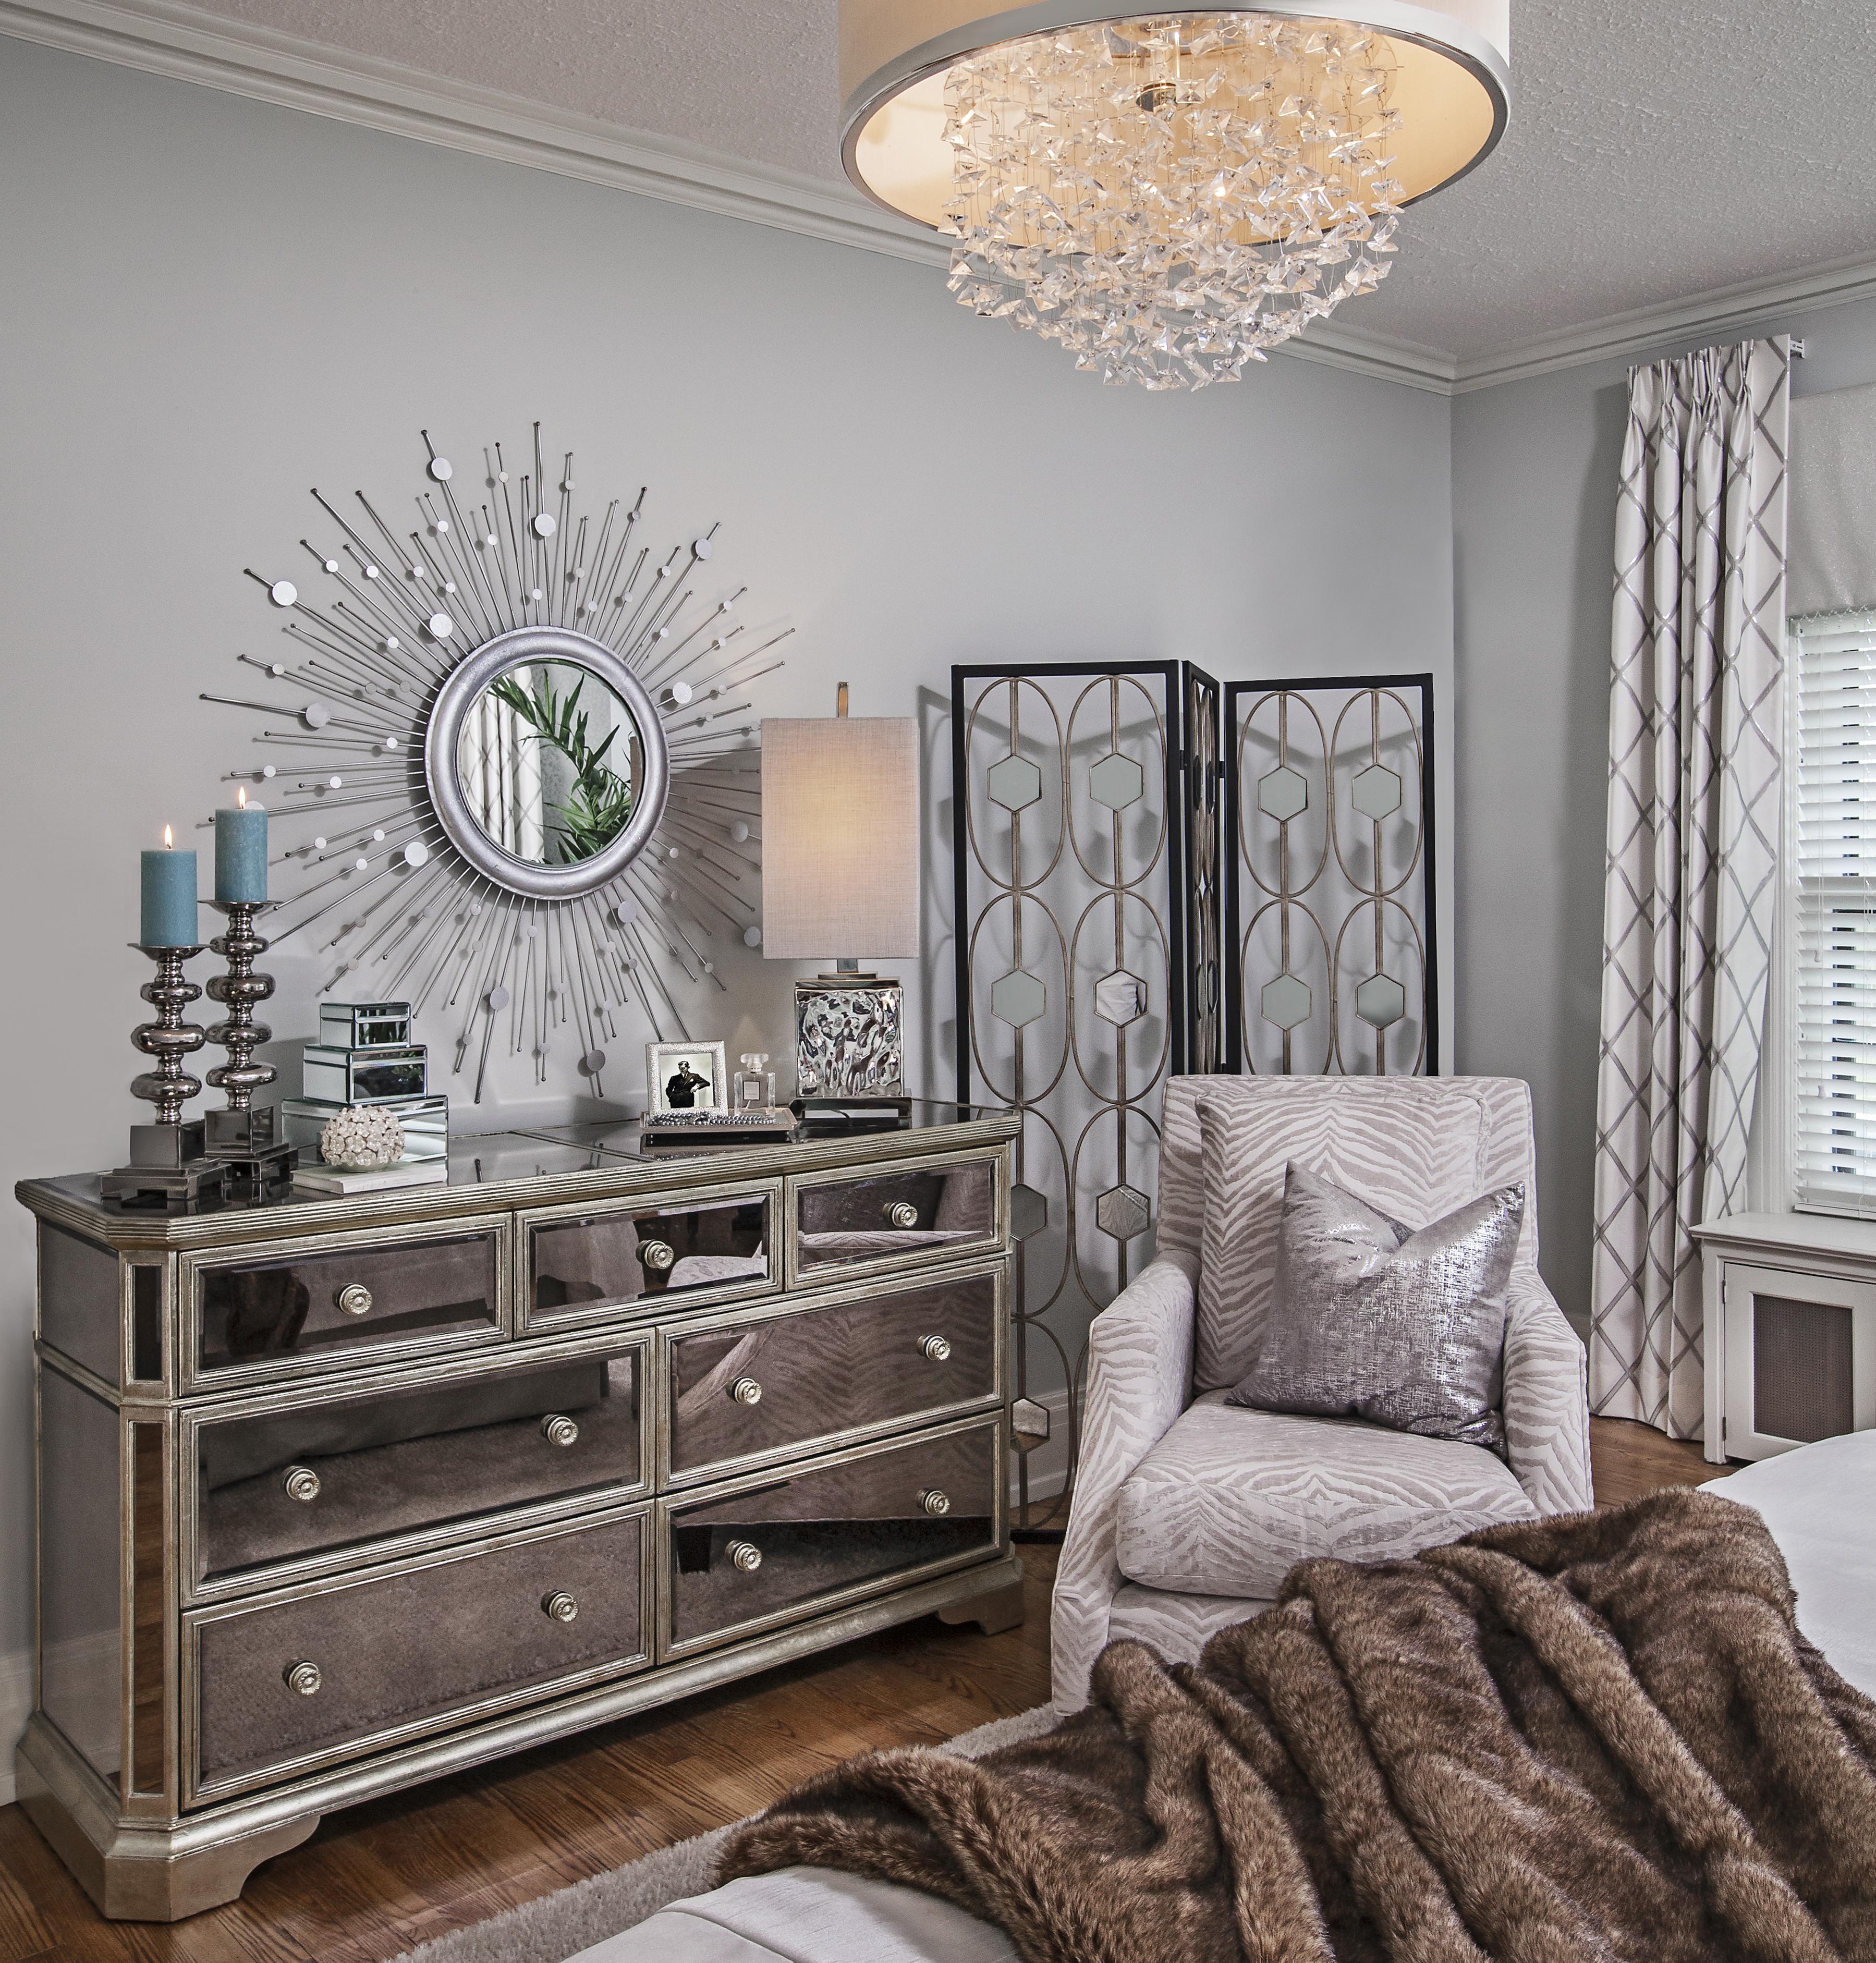 Glamorous Kids Bedroom Interior Design Ideas